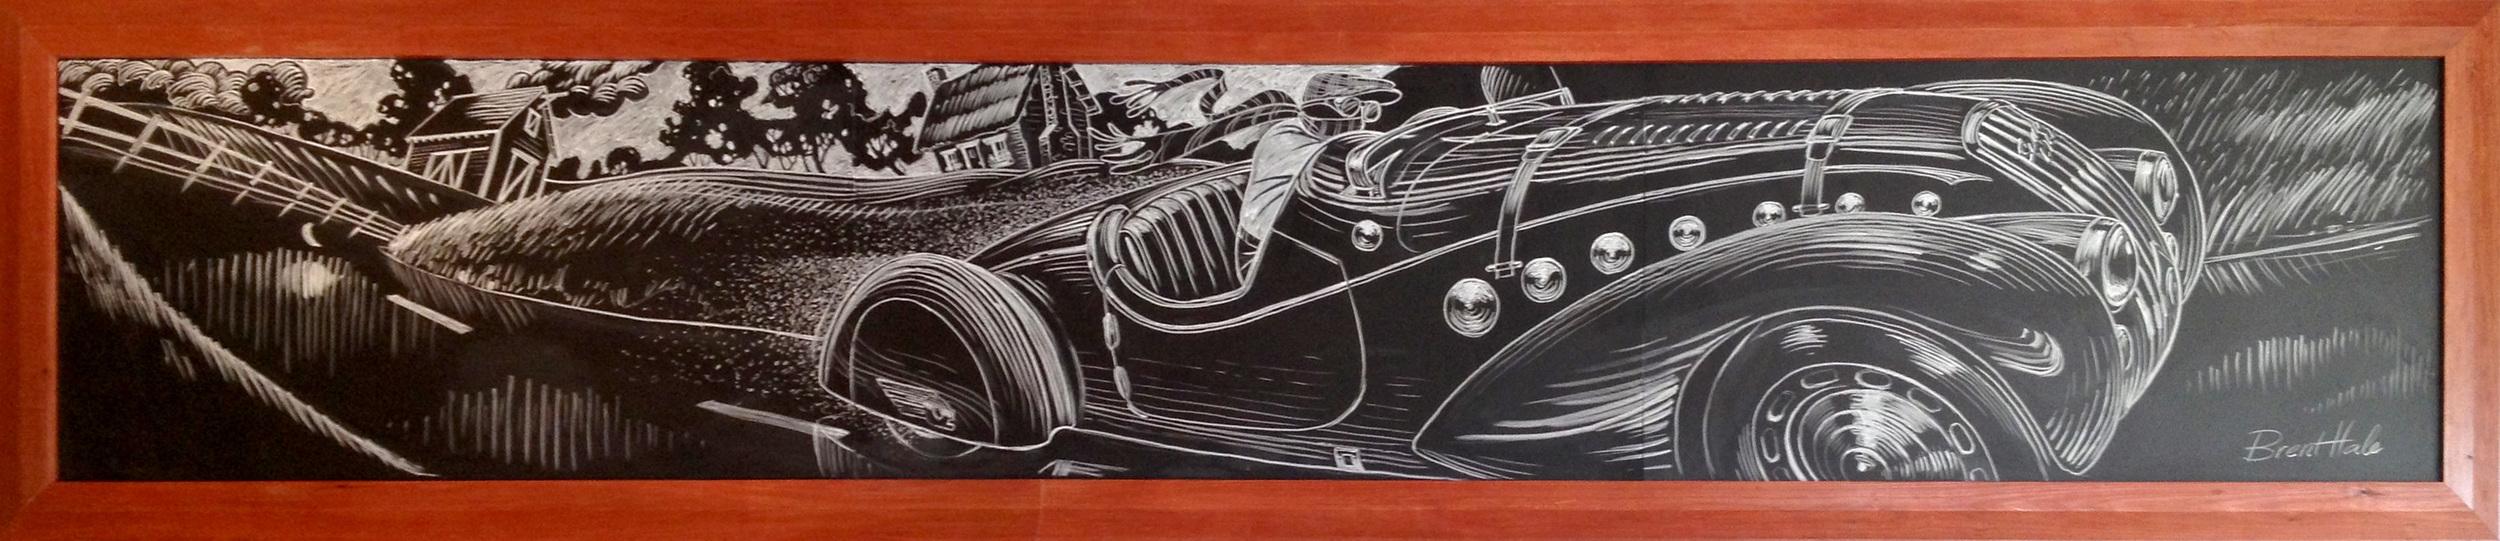 Lark On The Park - 1938 Peugeot 402 Darlmat Pourtout Roadster